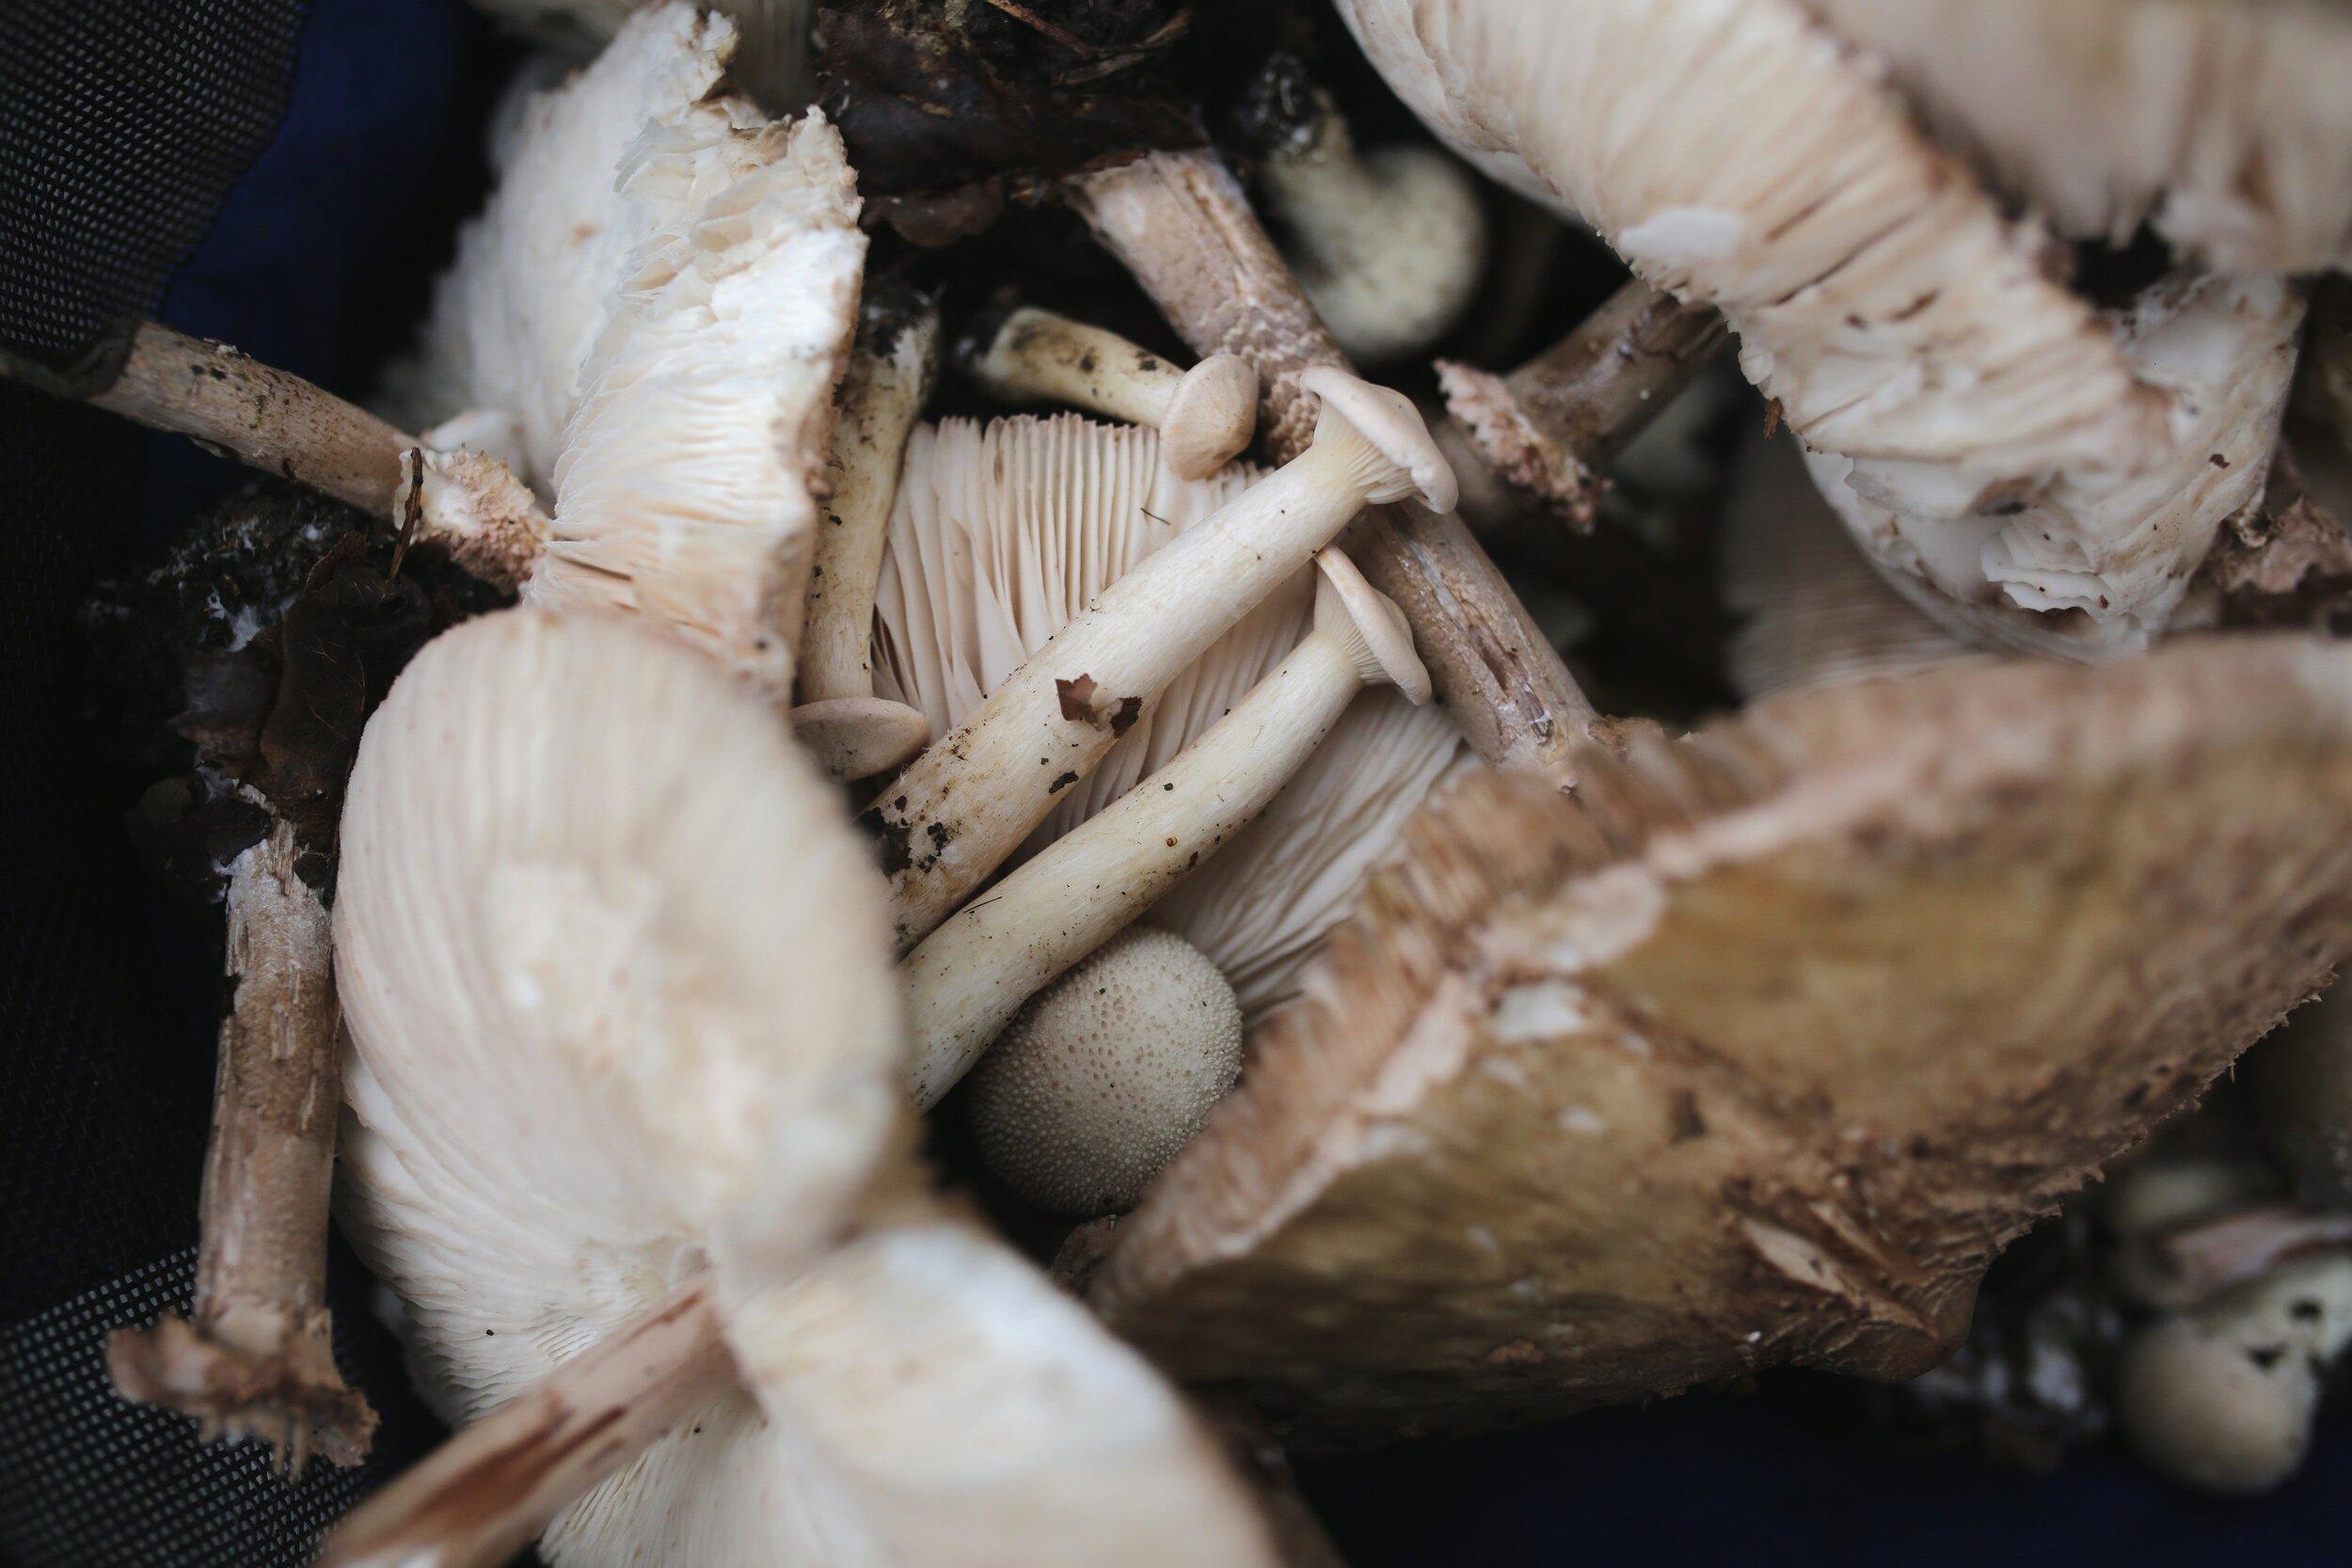 Carluccio's mushroom picking